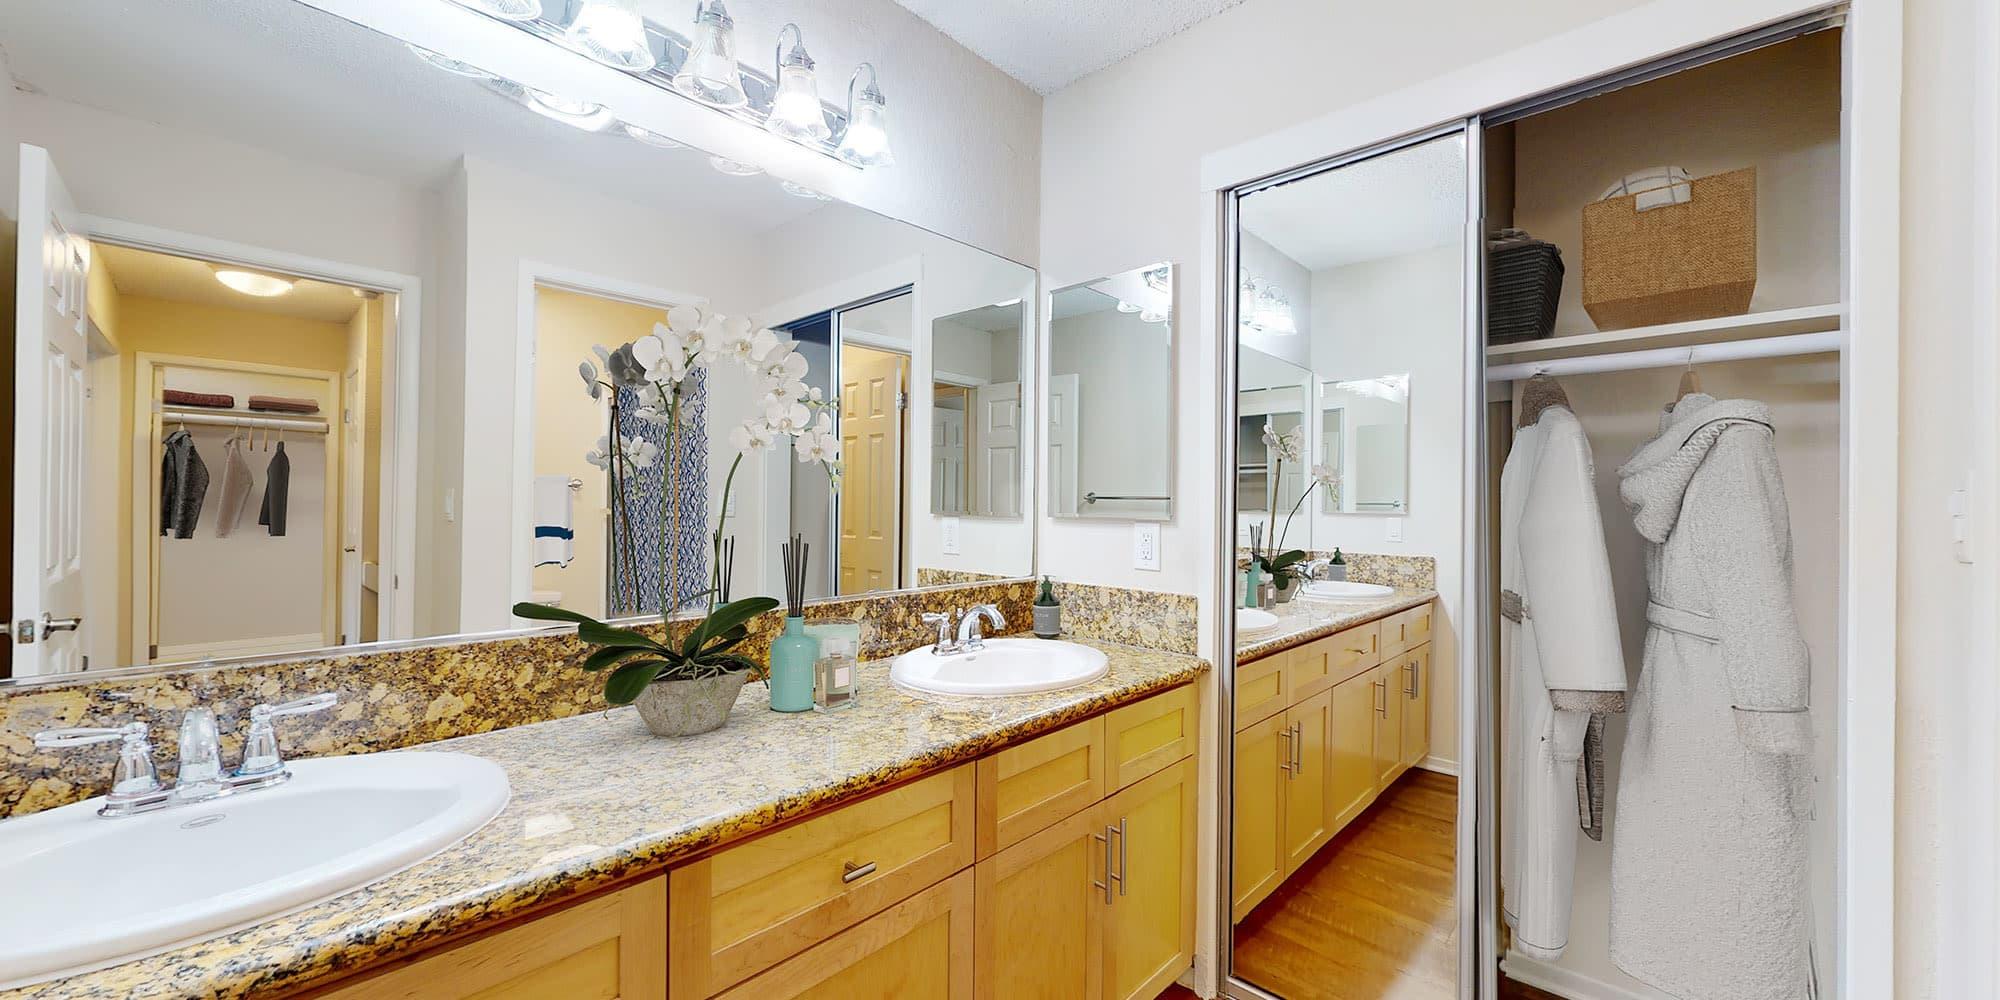 Bathroom double vanity at The Tides at Marina Harbor in Marina del Rey, California